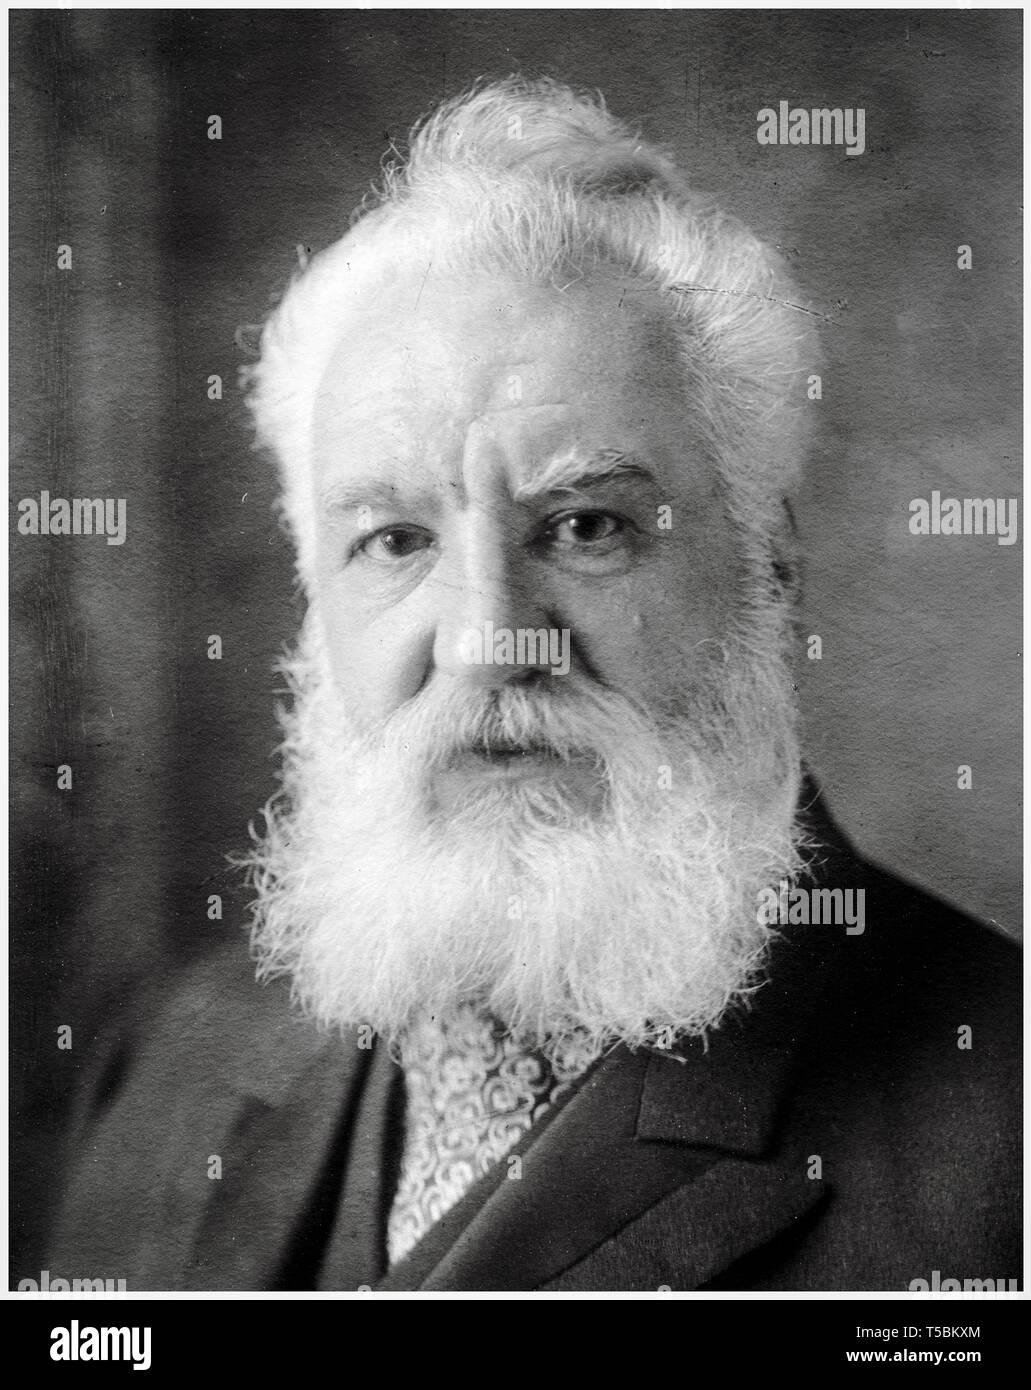 Alexander Graham Bell (1847-1922), portrait, c. 1850, Harris & Ewing Stock Photo